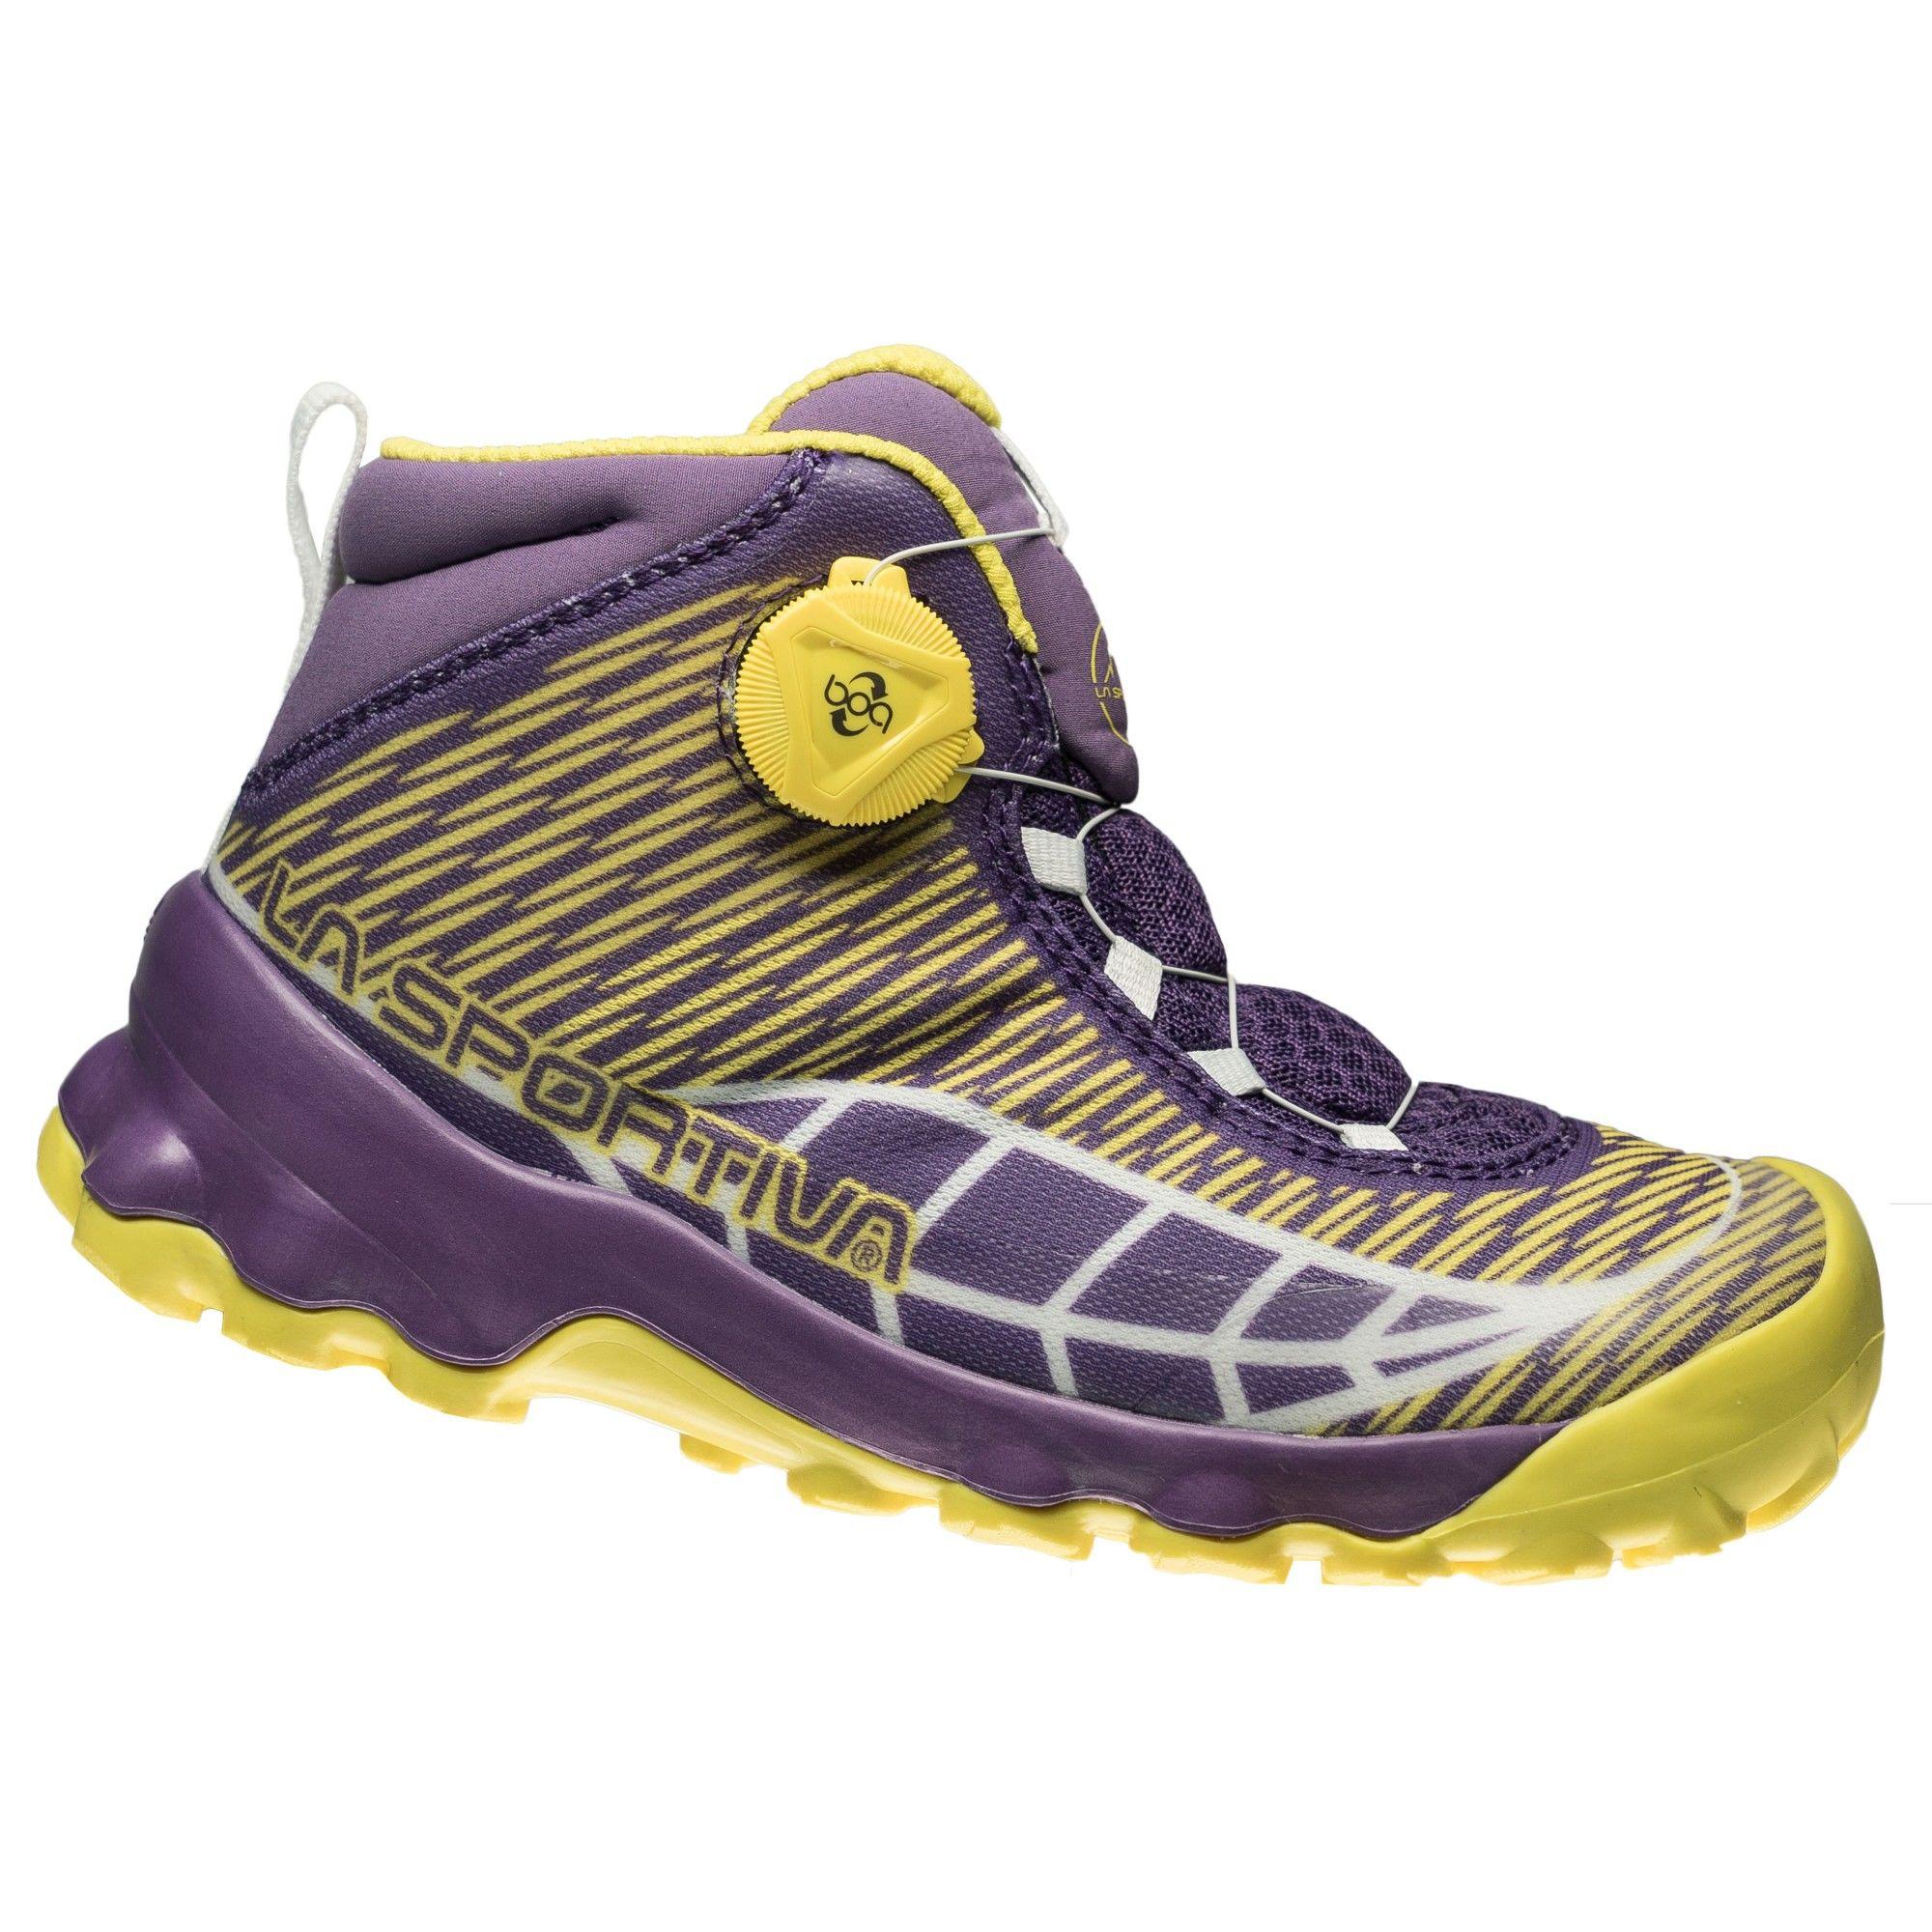 La Sportiva Kids Scout Lila/Violett, EU 35 -Farbe Purple, EU 35